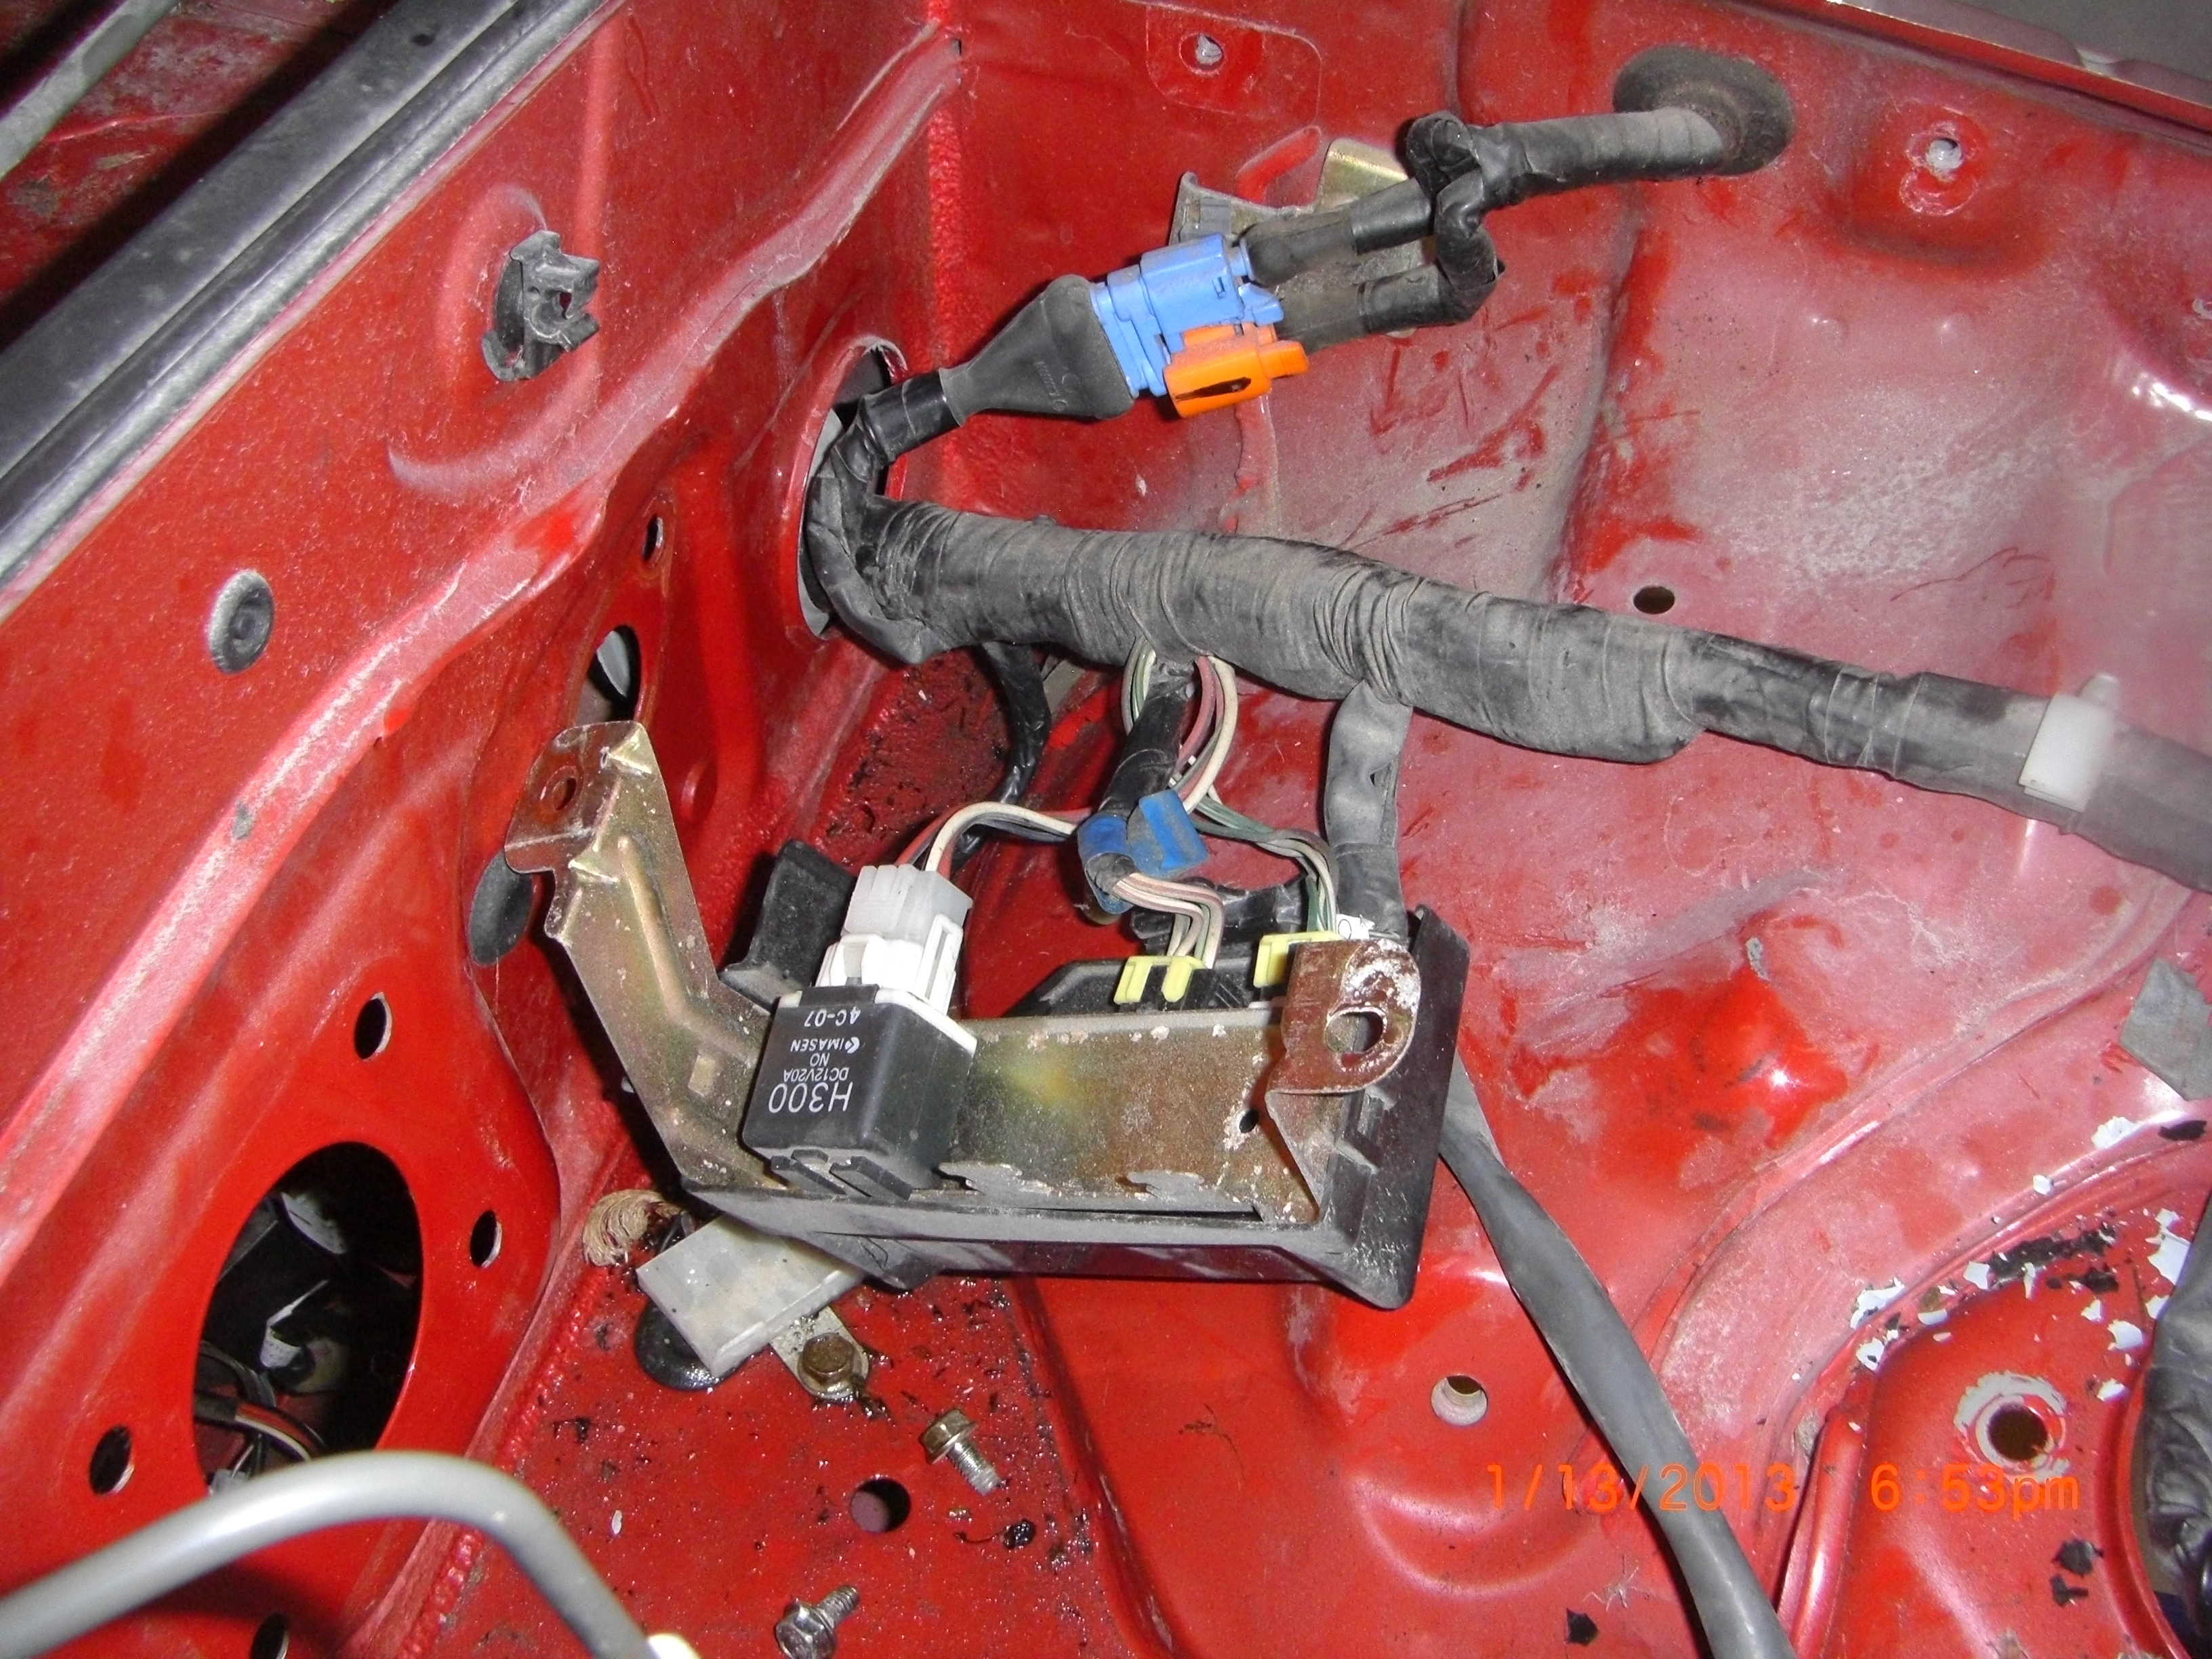 H012 removing miata donor parts 5 of 9,how do you remove a miata wire miata wiring harness removal at pacquiaovsvargaslive.co